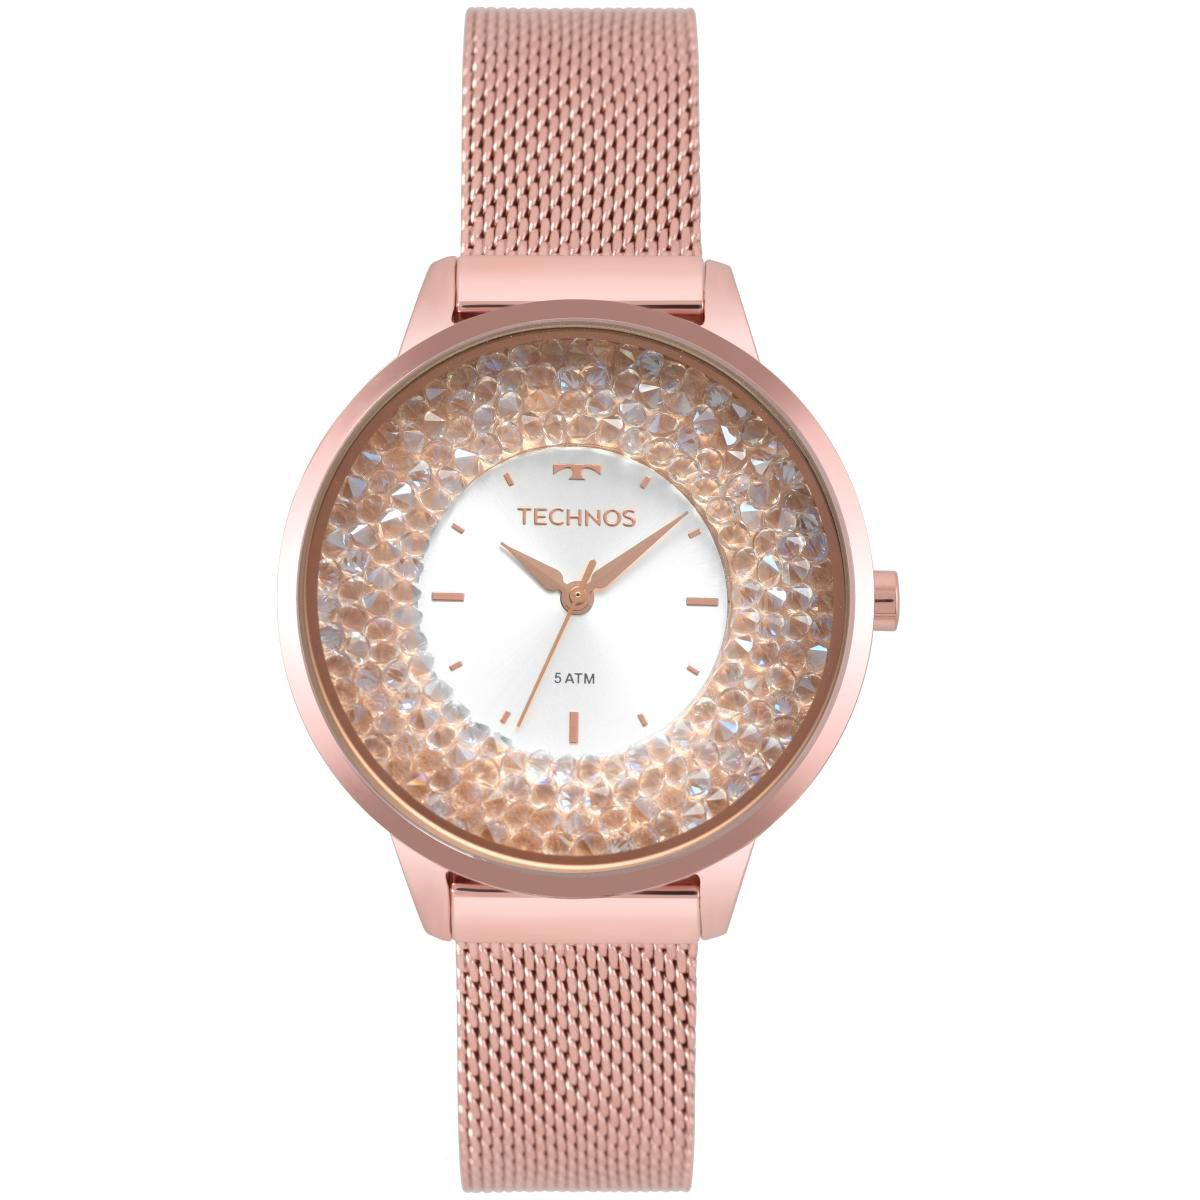 Relógio Feminino Technos Crystal 2035MQB/5K 38mm Aço Rosê